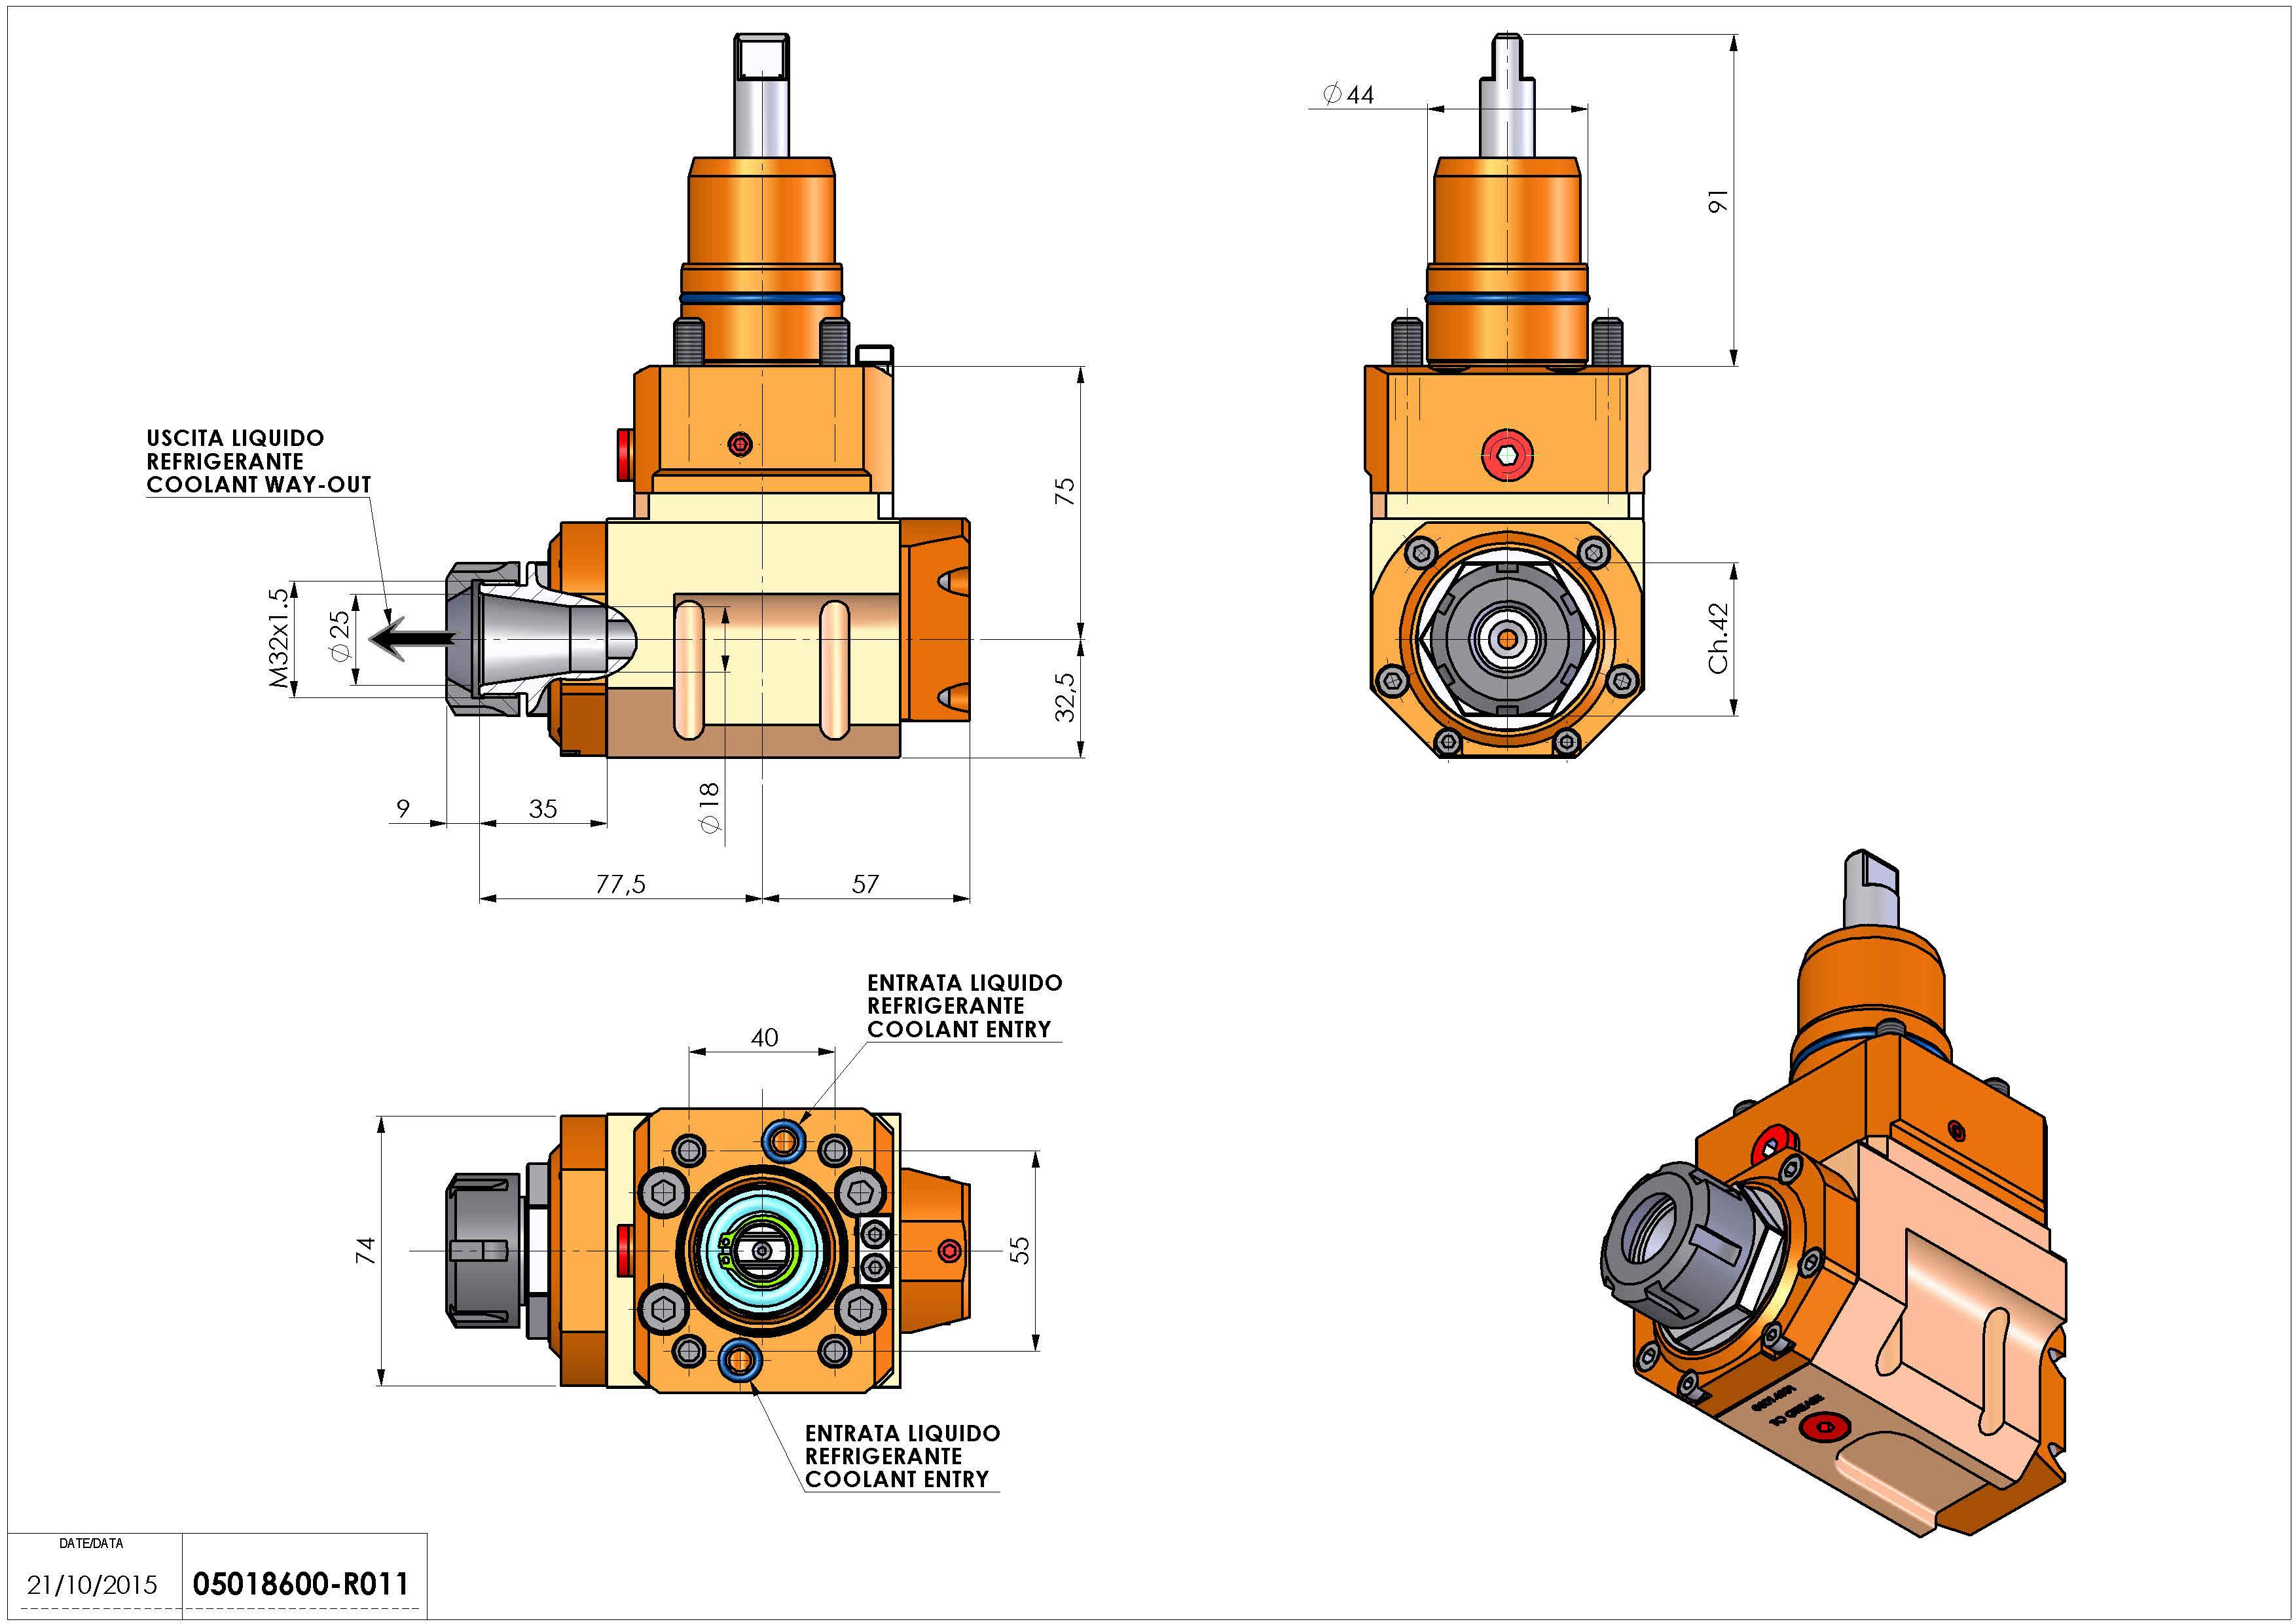 Technical image - LT-A D44 ER25 L-R RF H75 NK.